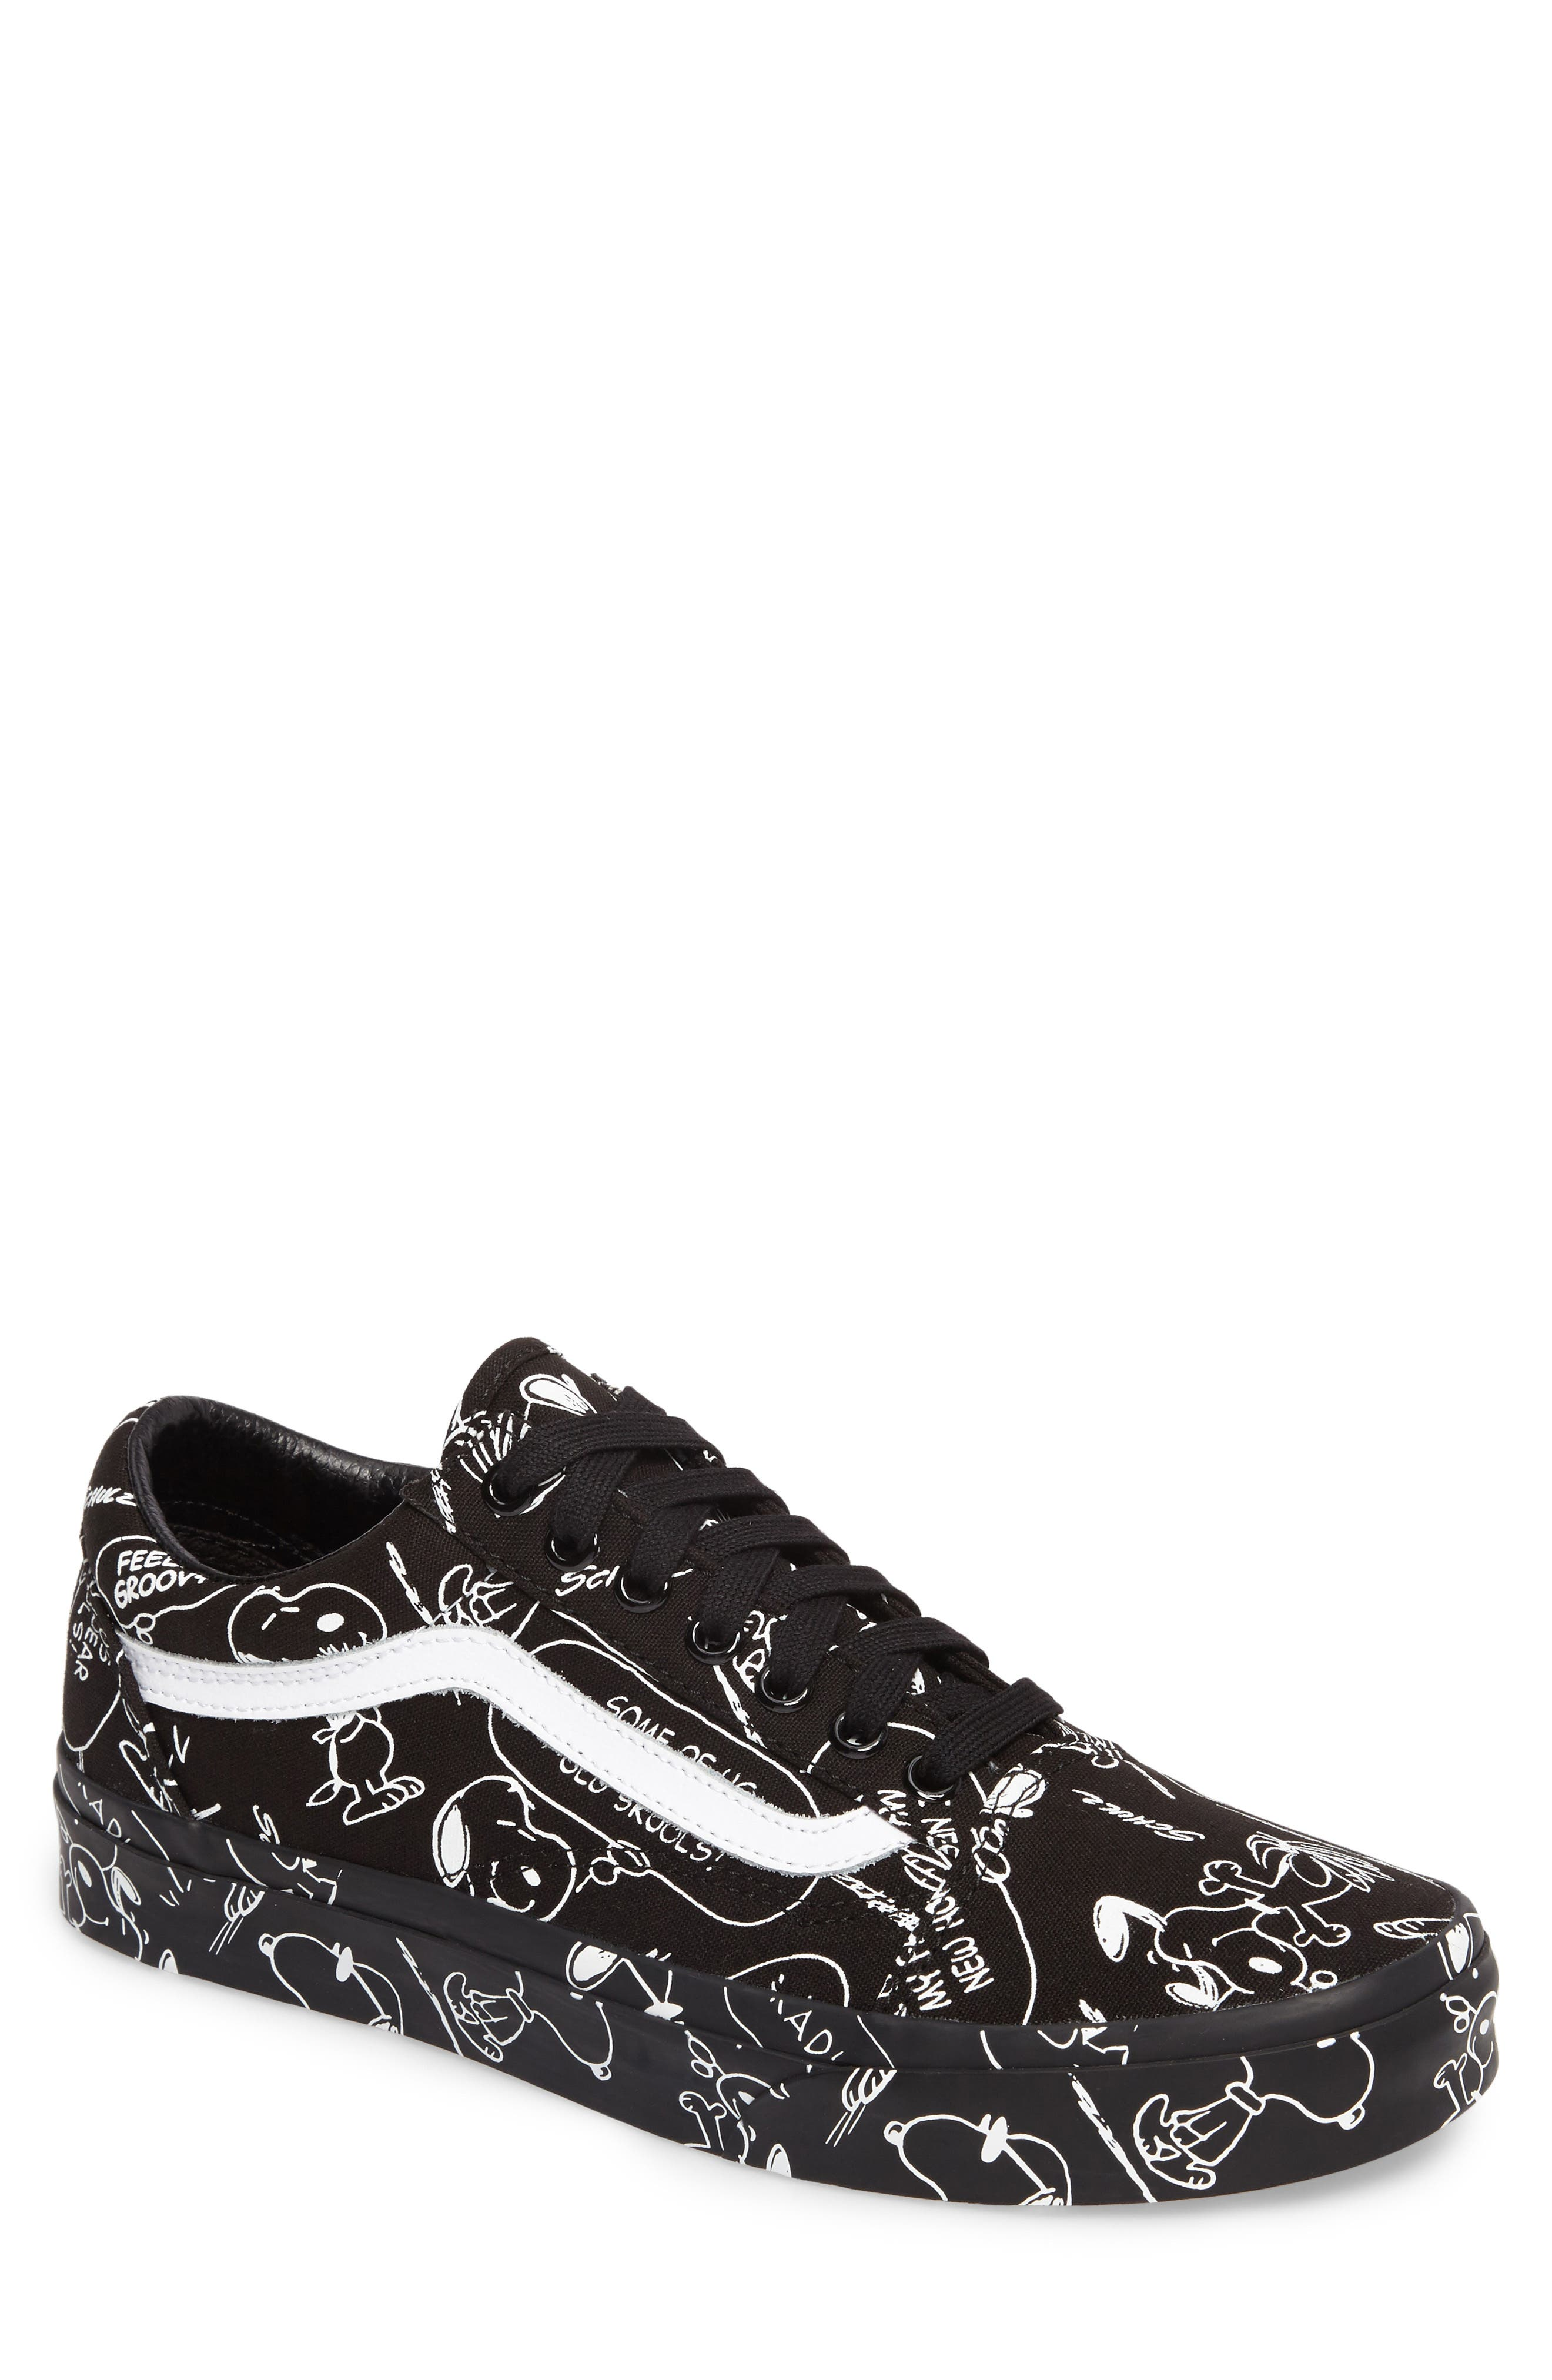 x Peanuts<sup>®</sup> Old Skool Sneaker,                         Main,                         color, Black Canvas